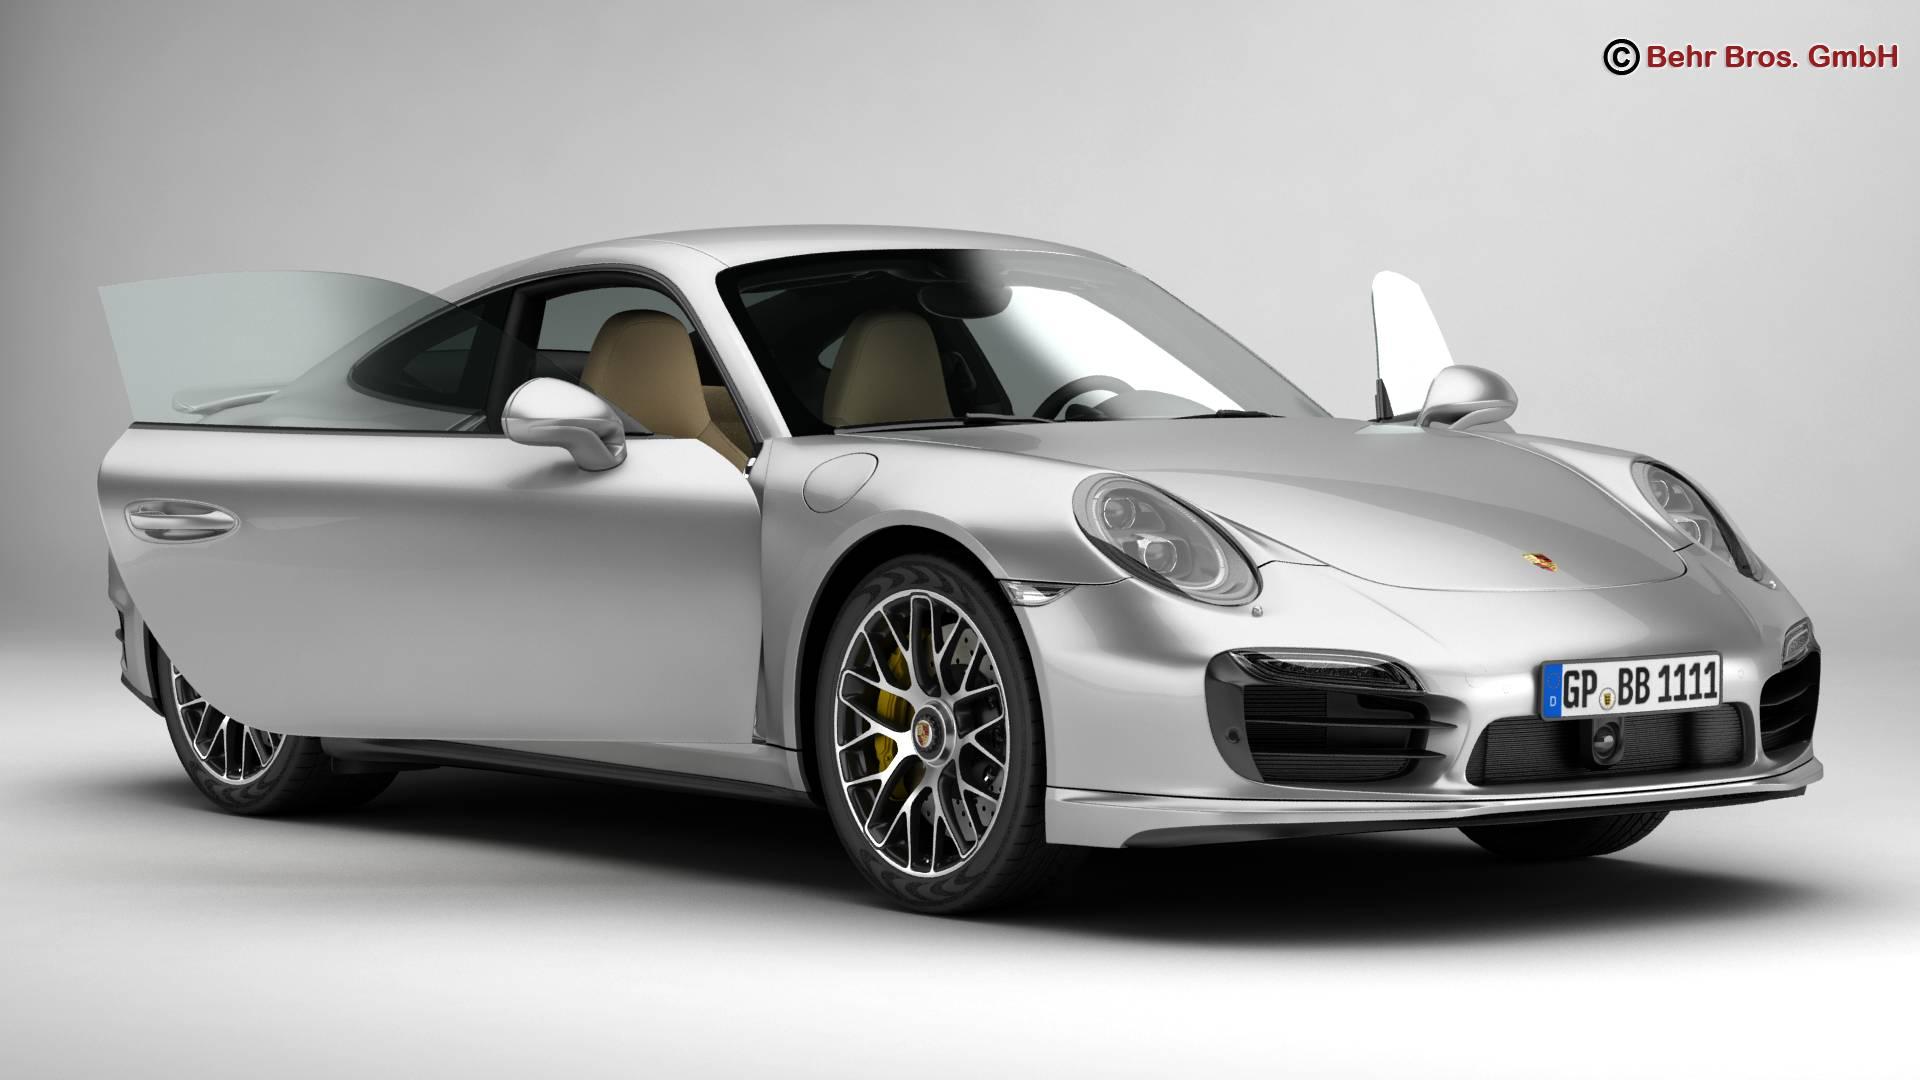 porsche 911 turbo s 2014 3d model 3ds max fbx c4d lwo ma mb obj 212477